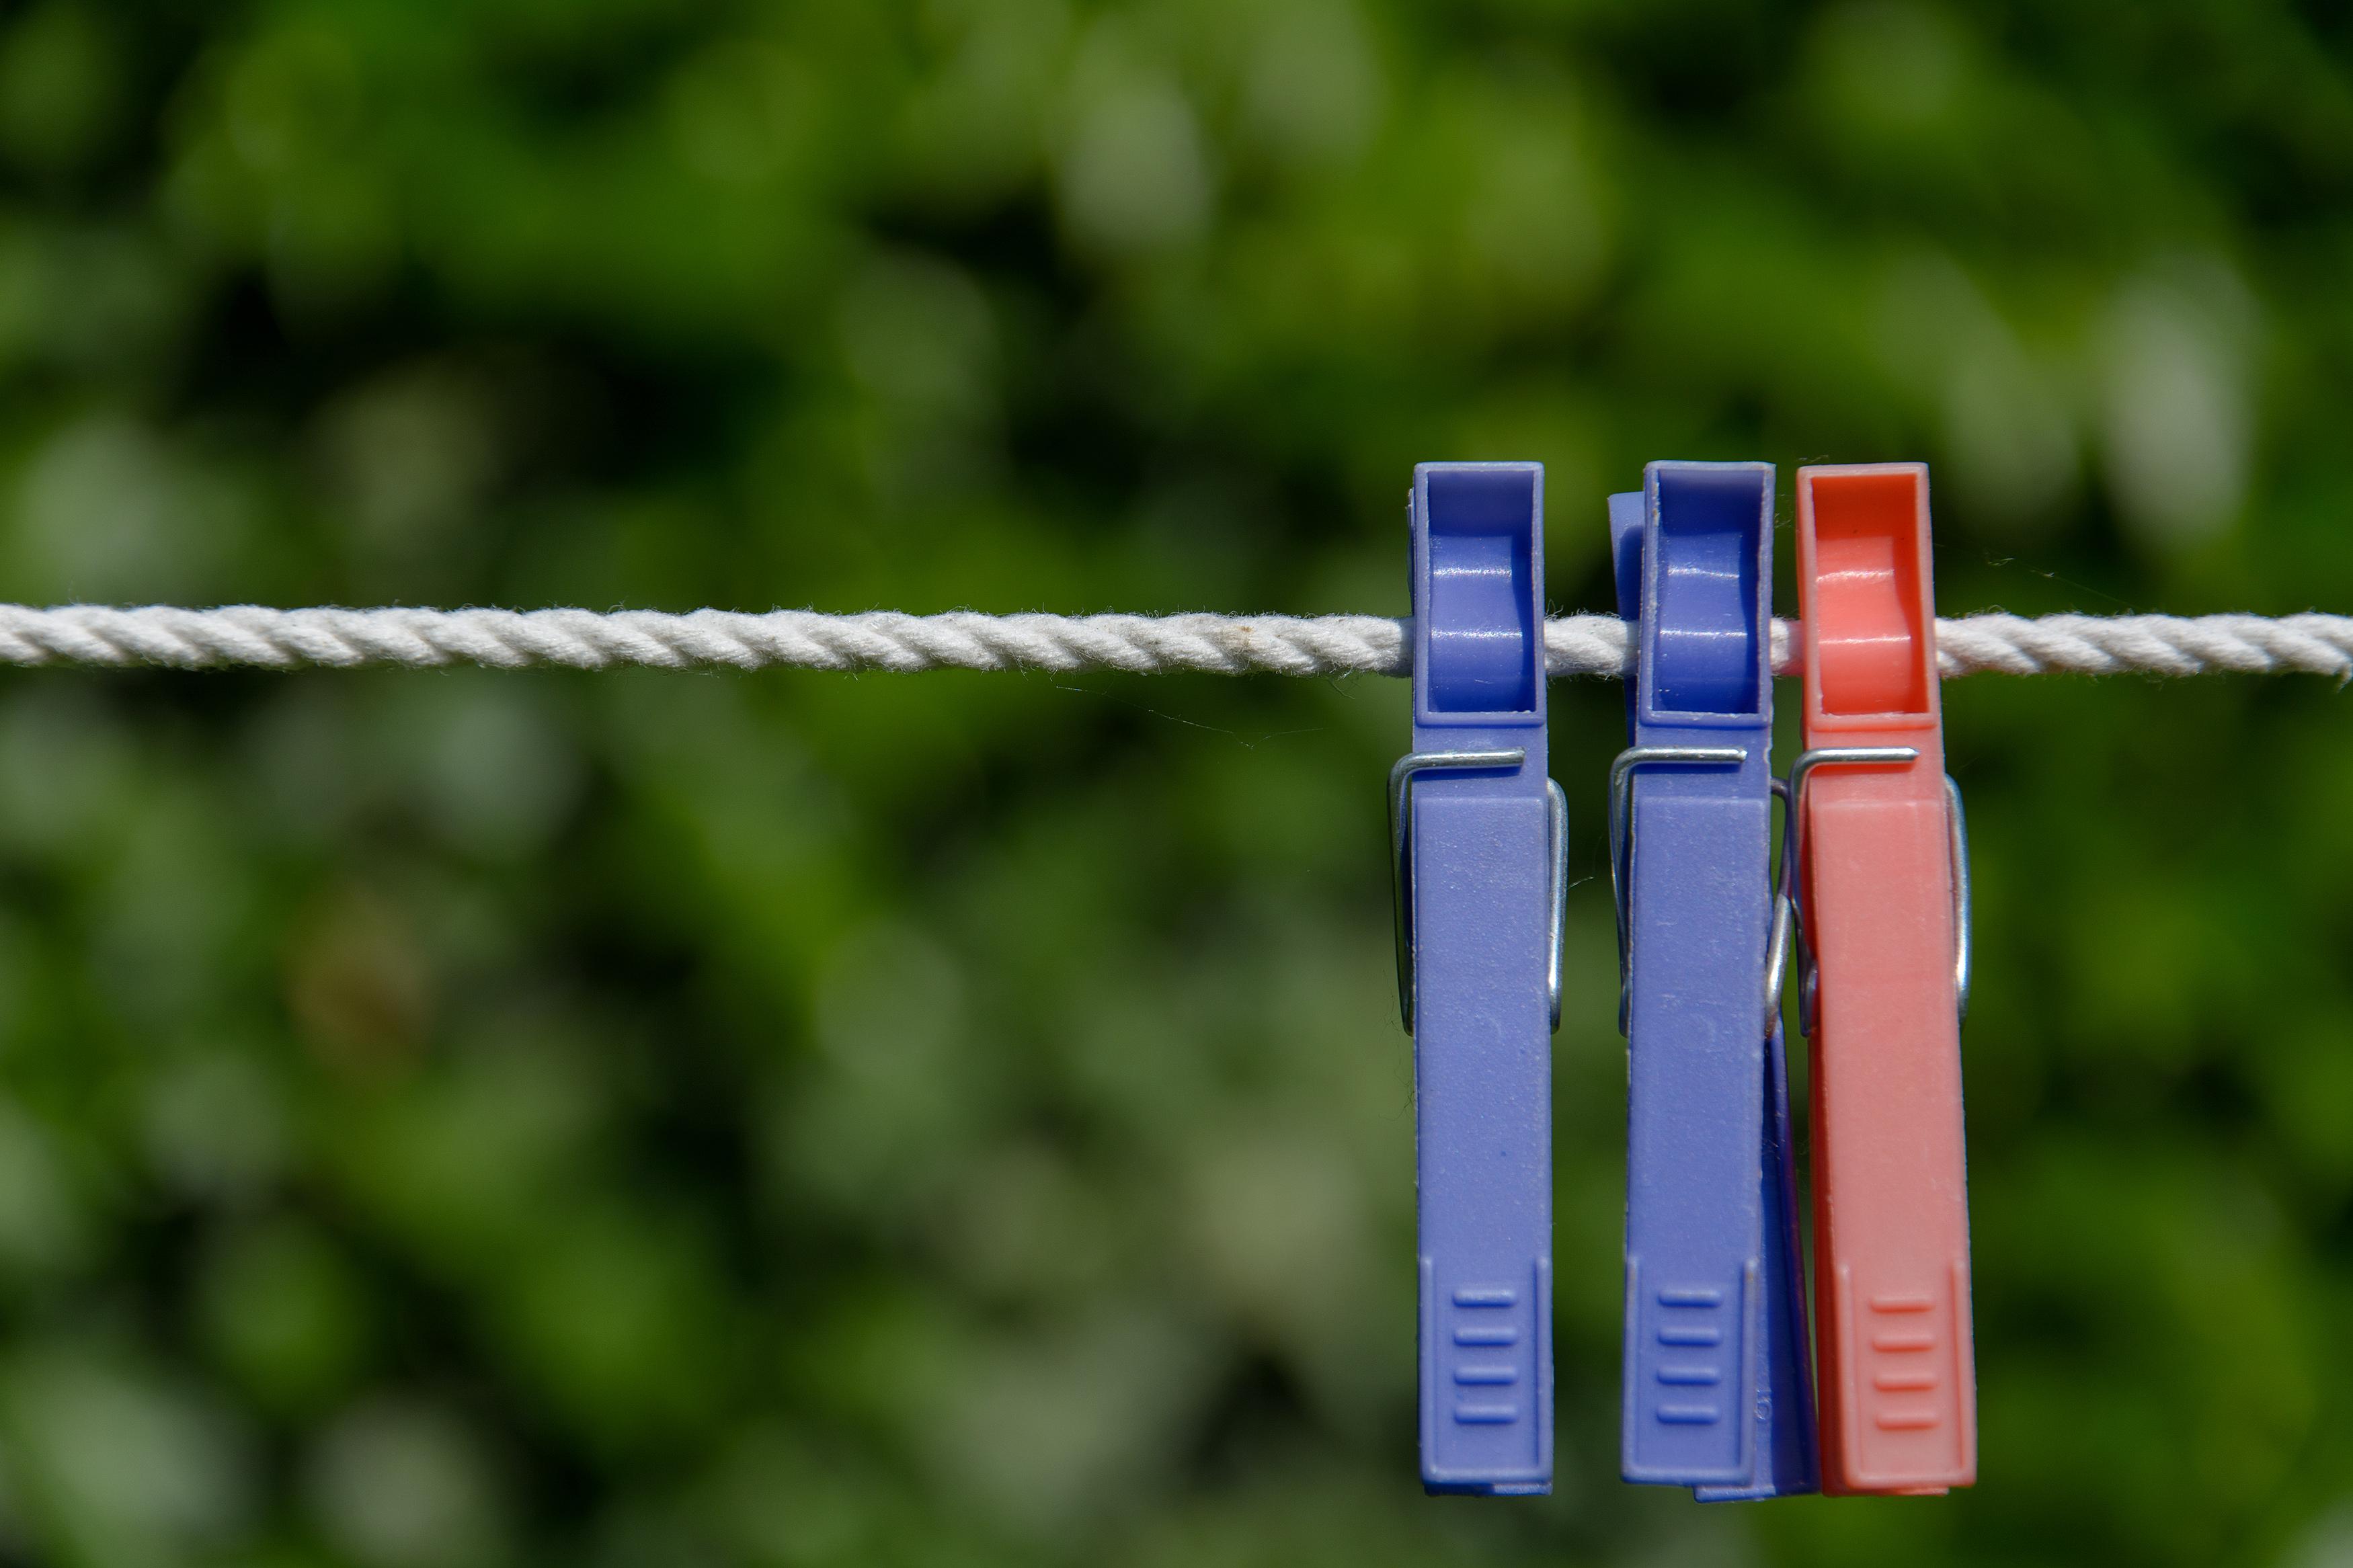 FREE IMAGE: Three Clothespins - Libreshot Public Domain Photos